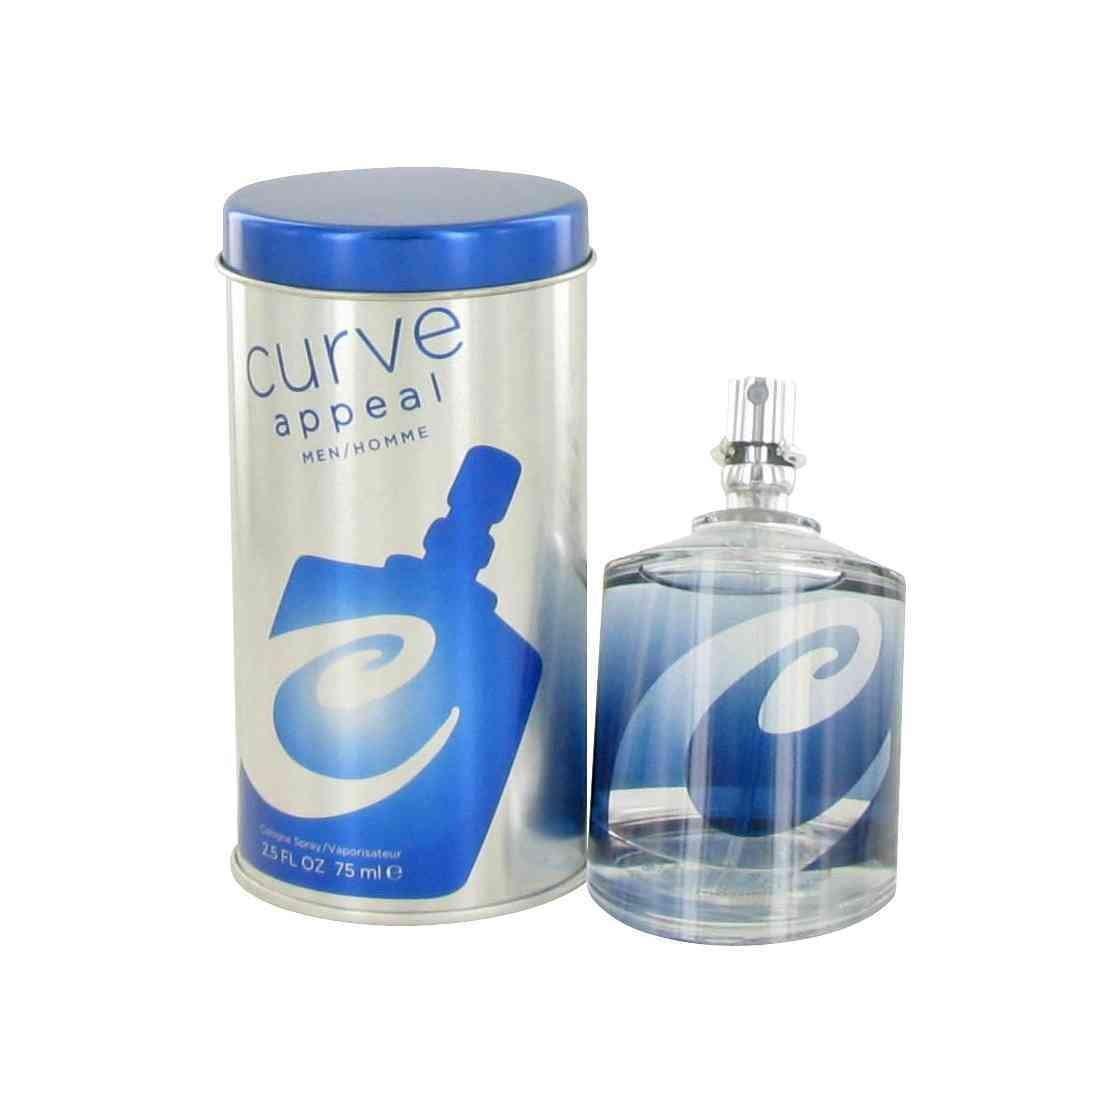 Liz Claiborne Curve Appeal for Men аромат для мужчин